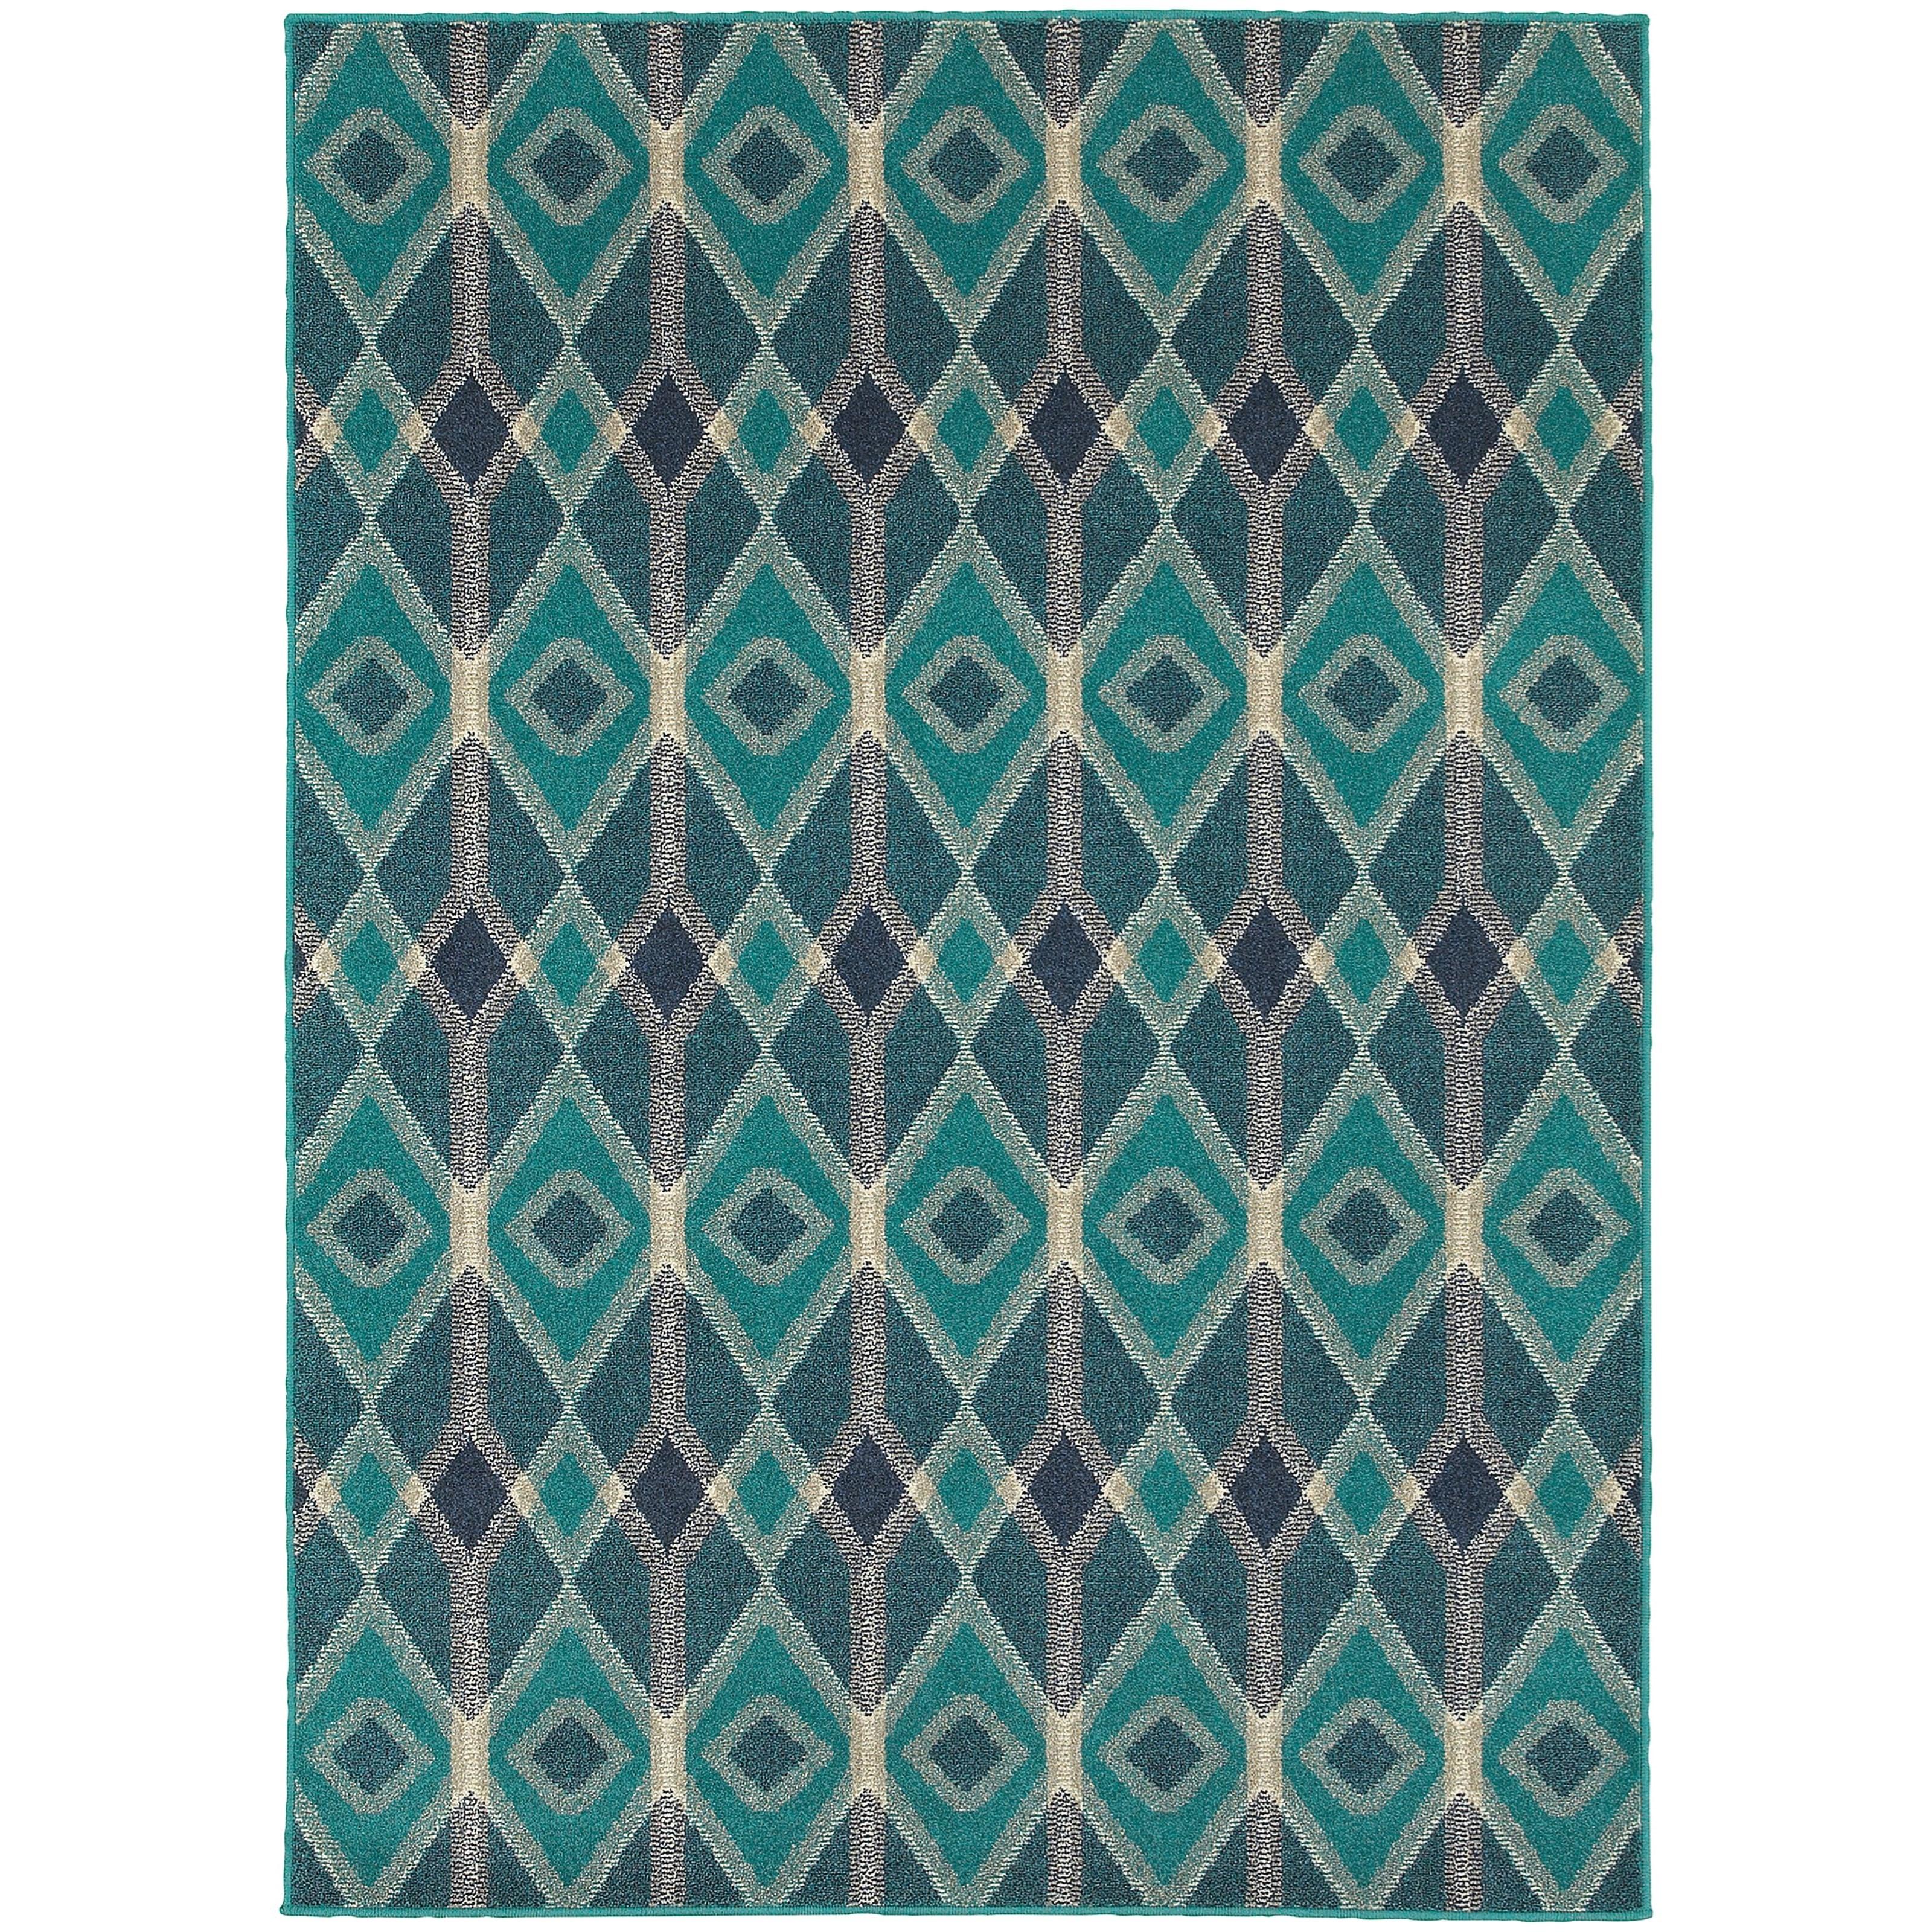 "Oriental Weavers Highlands 3'10"" X  5' 5"" Rectangle Area Rug - Item Number: HIG6627B310X55"